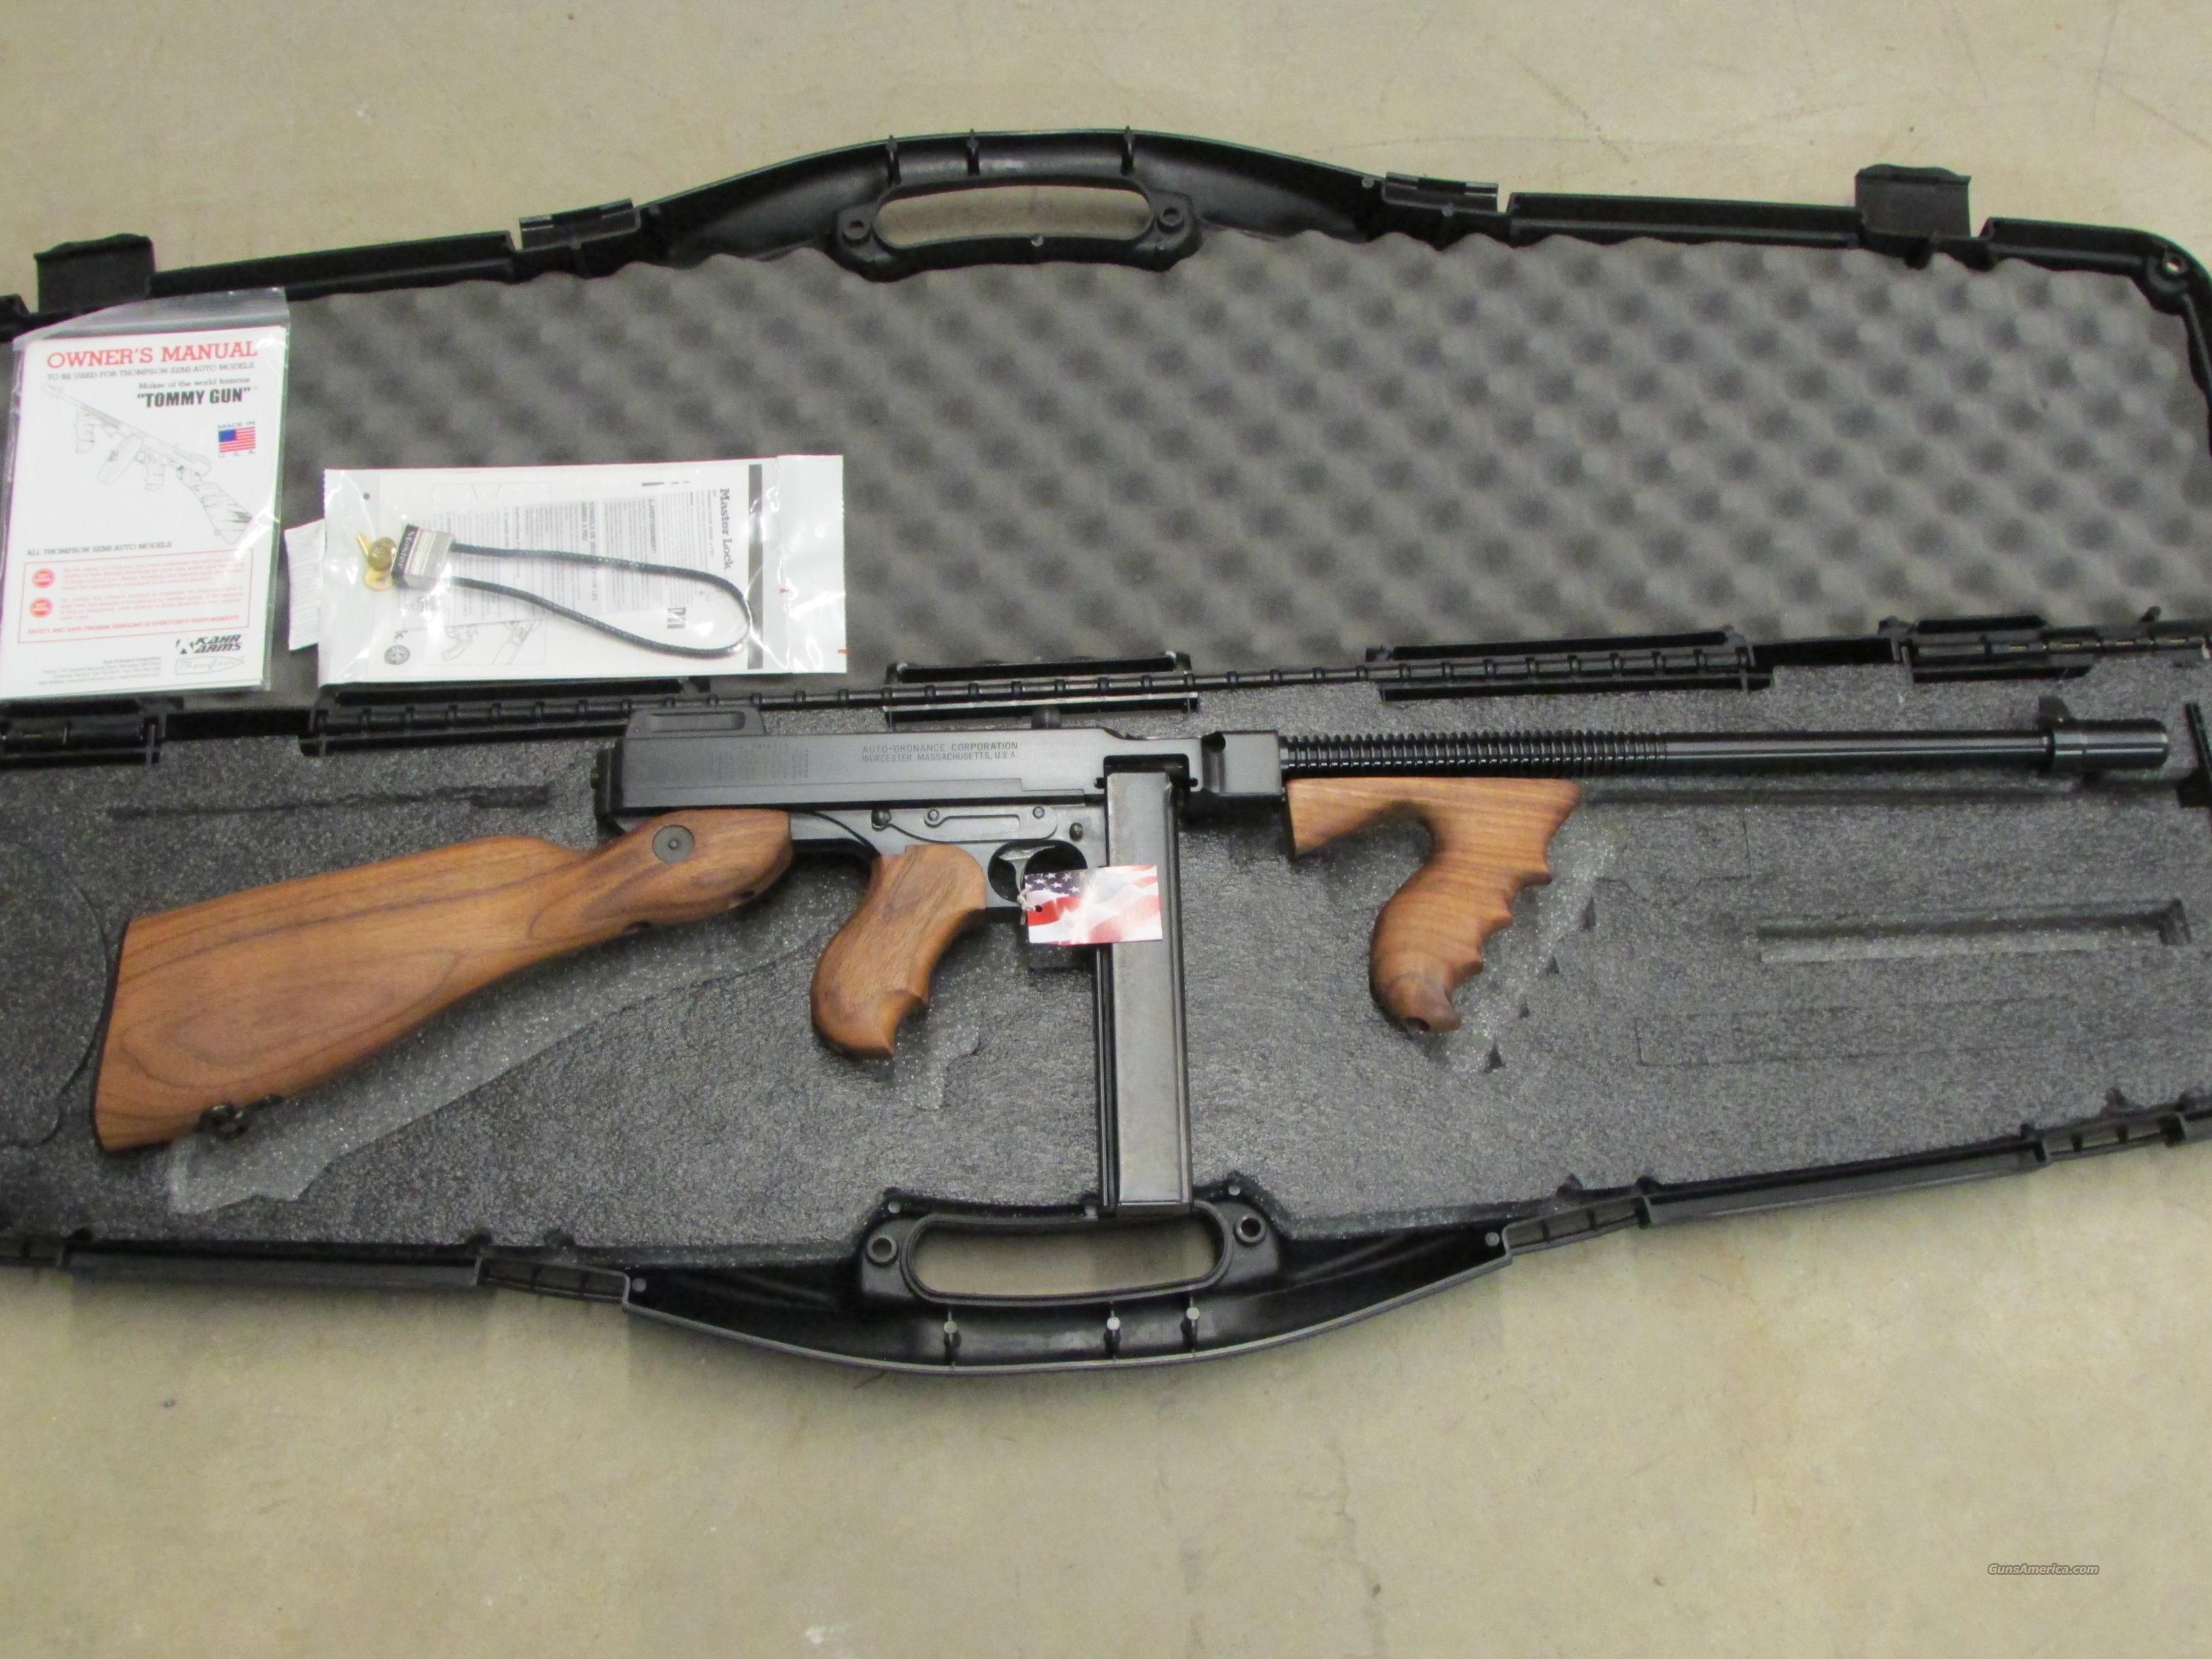 Auto-Ordnance Thompson T1  45 ACP Carbine 16 5